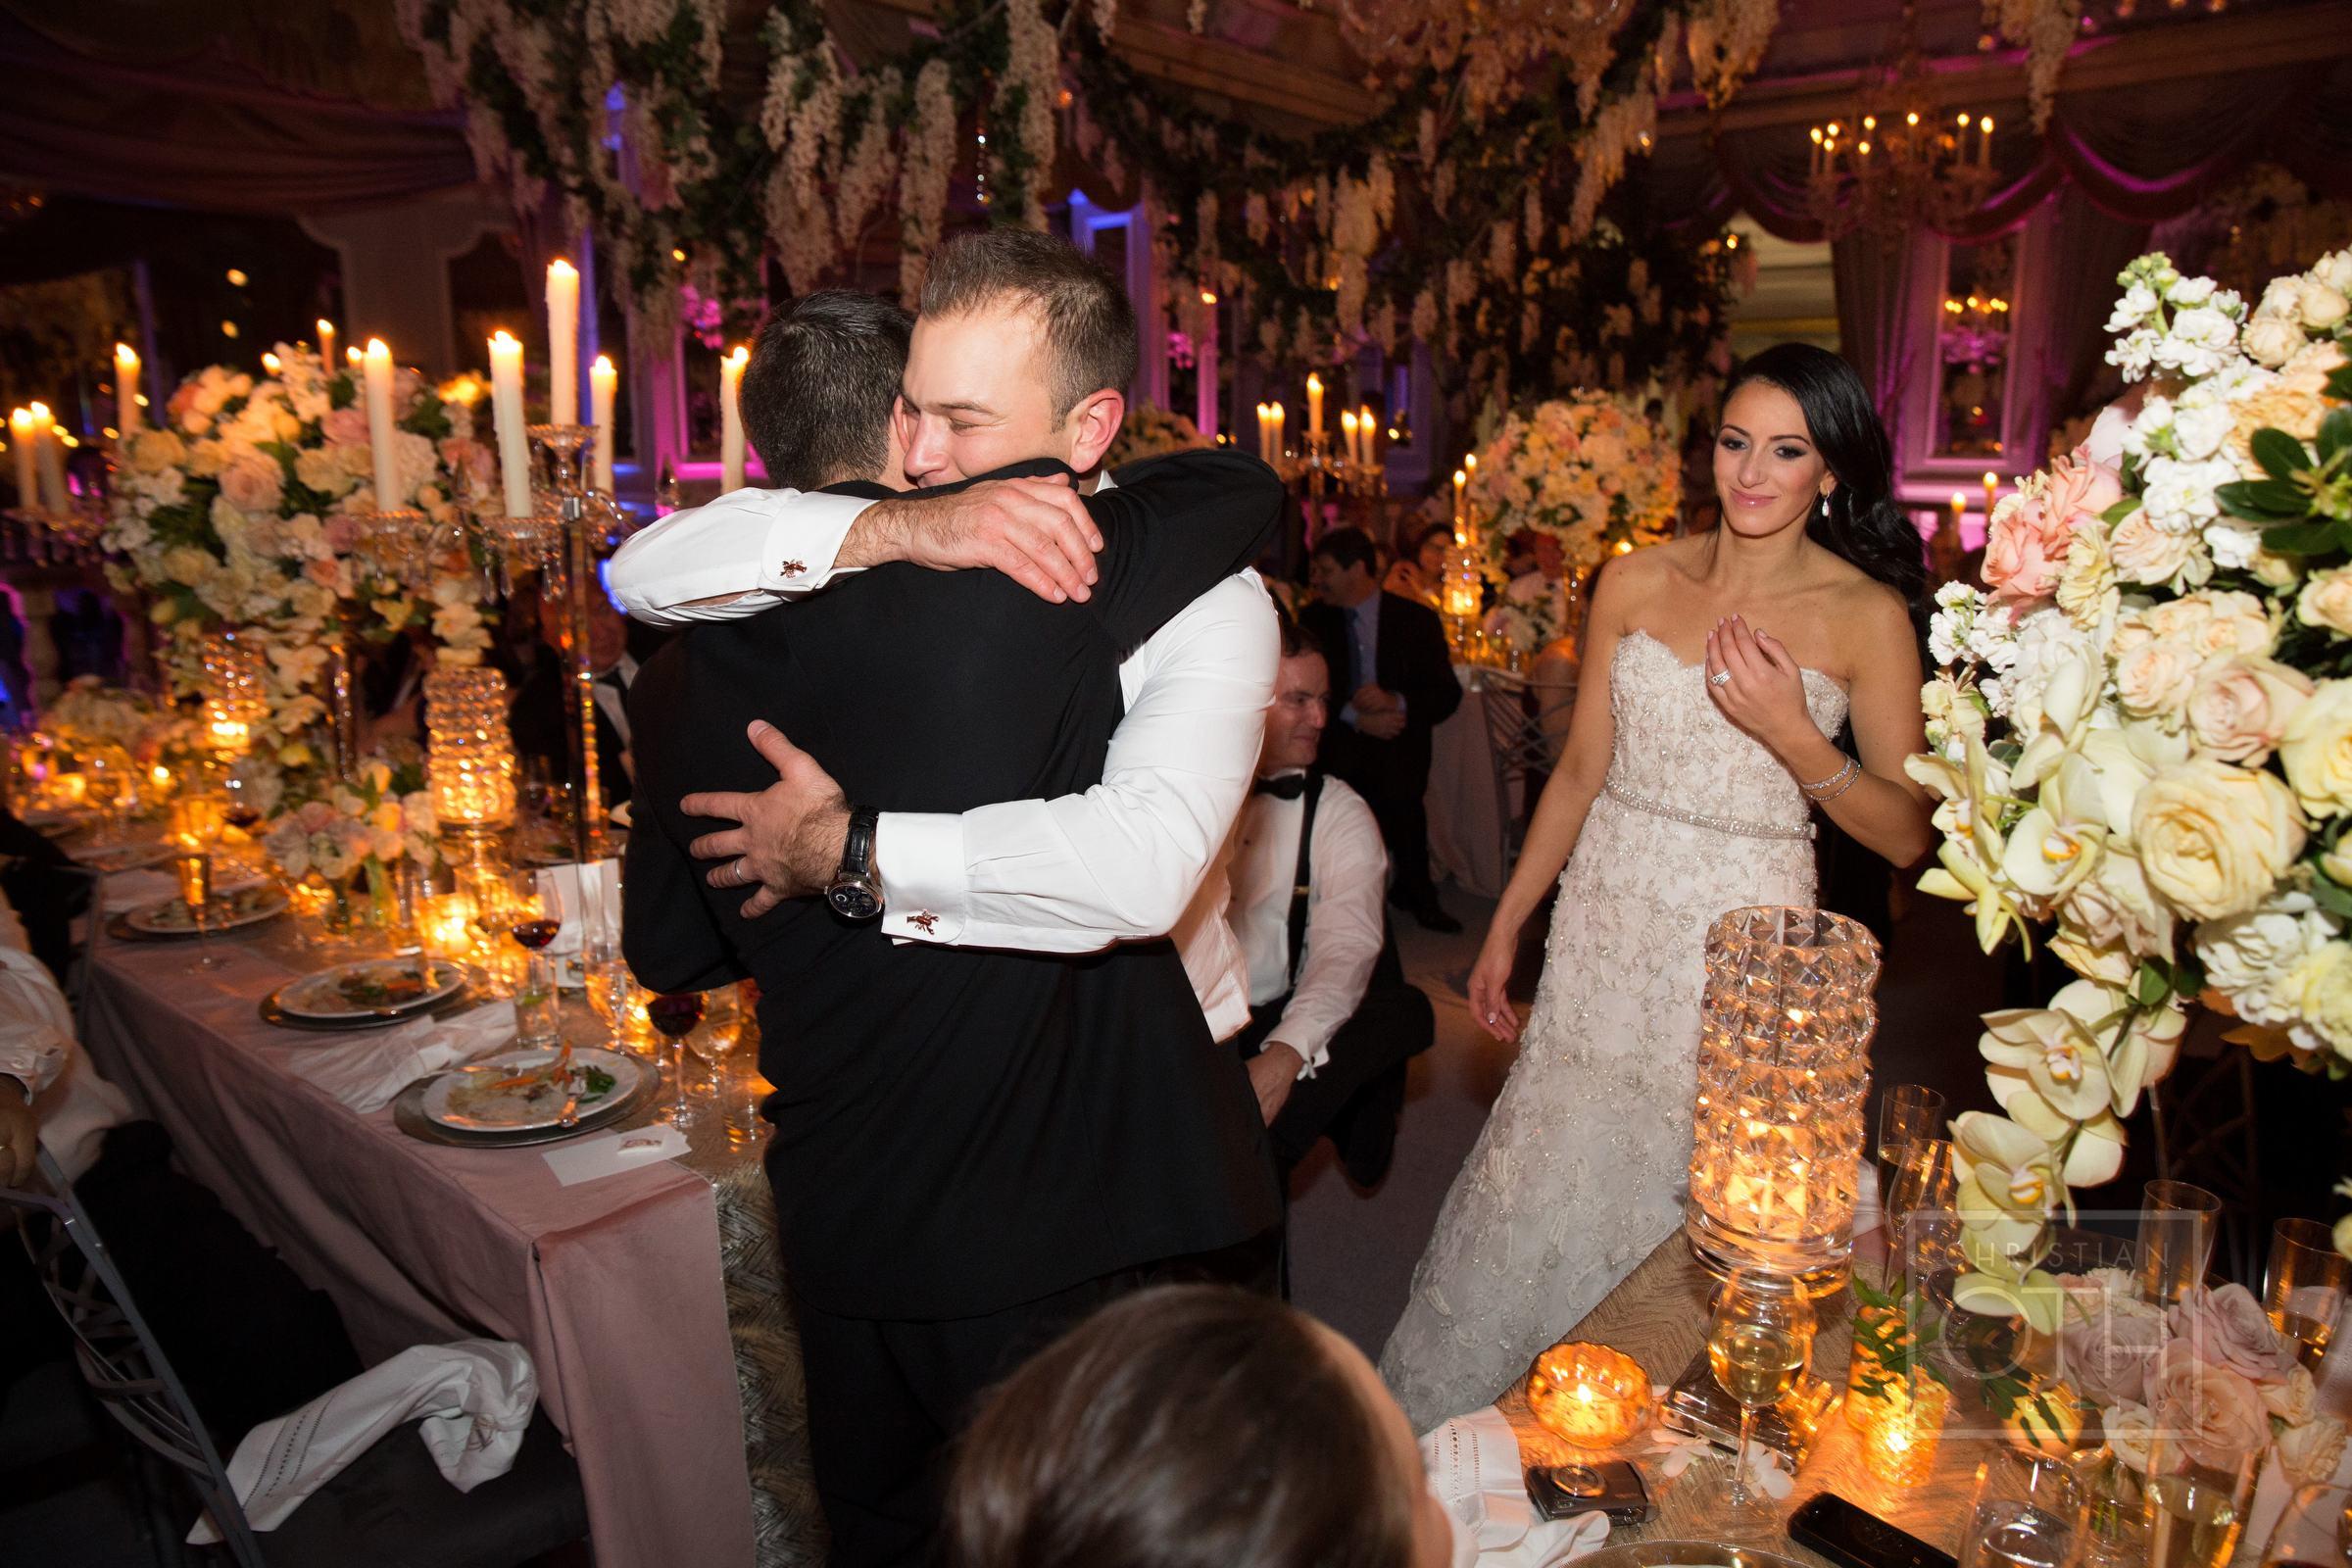 Ceci_New_York_Custom_Invitation_Pierre__City_ Destination_Wedding_Luxury_Personalized_Ceci_Style_Bride_Rose_Gold_Foil_Stamping170.JPG